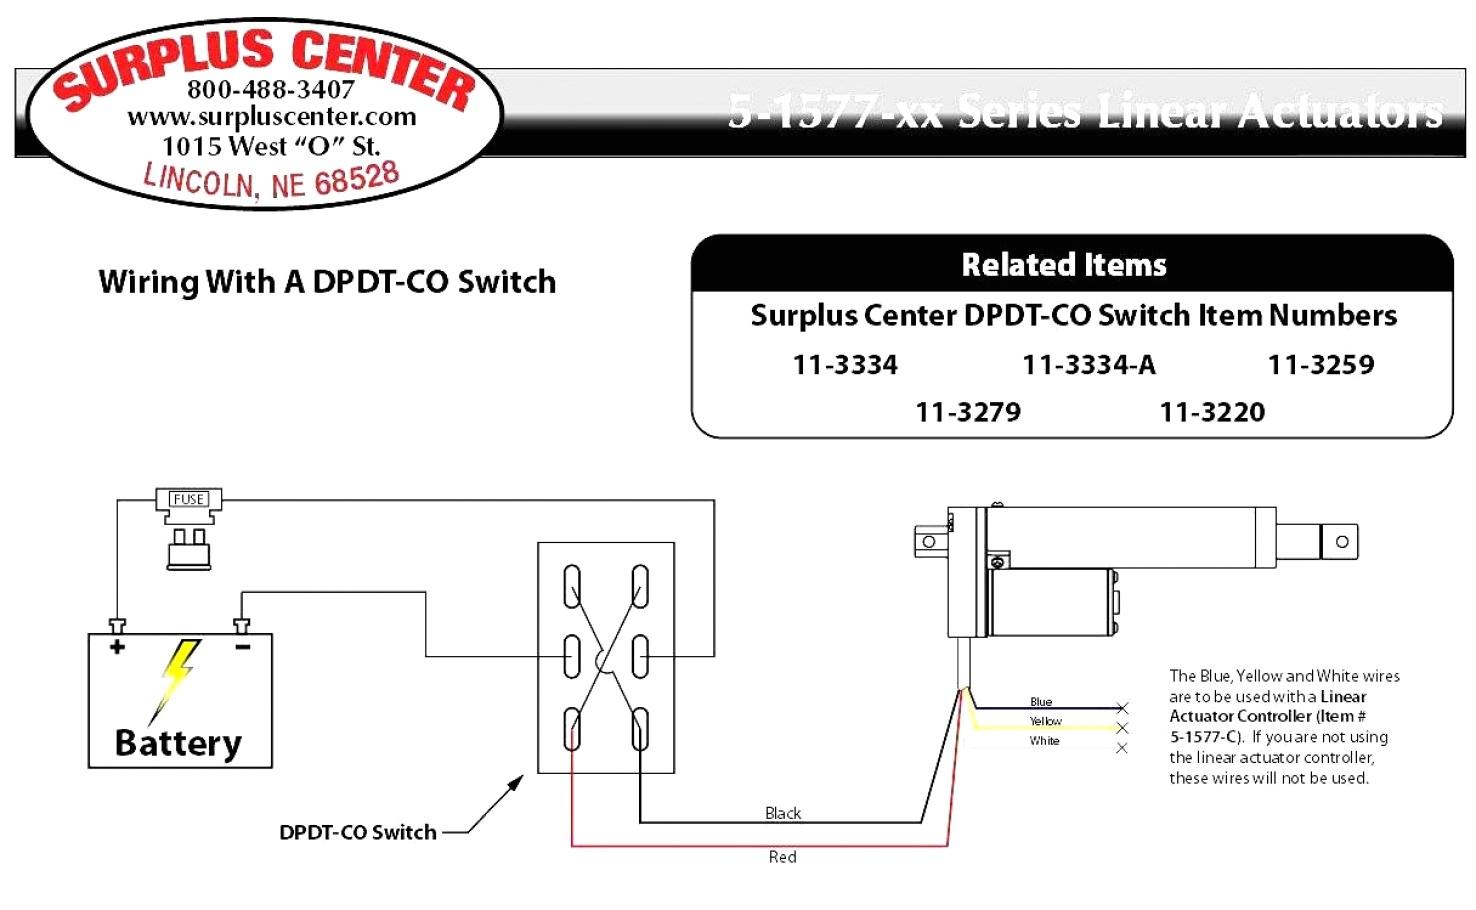 honeywell ats wiring diagram wiring diagram honeywell ats wiring diagram